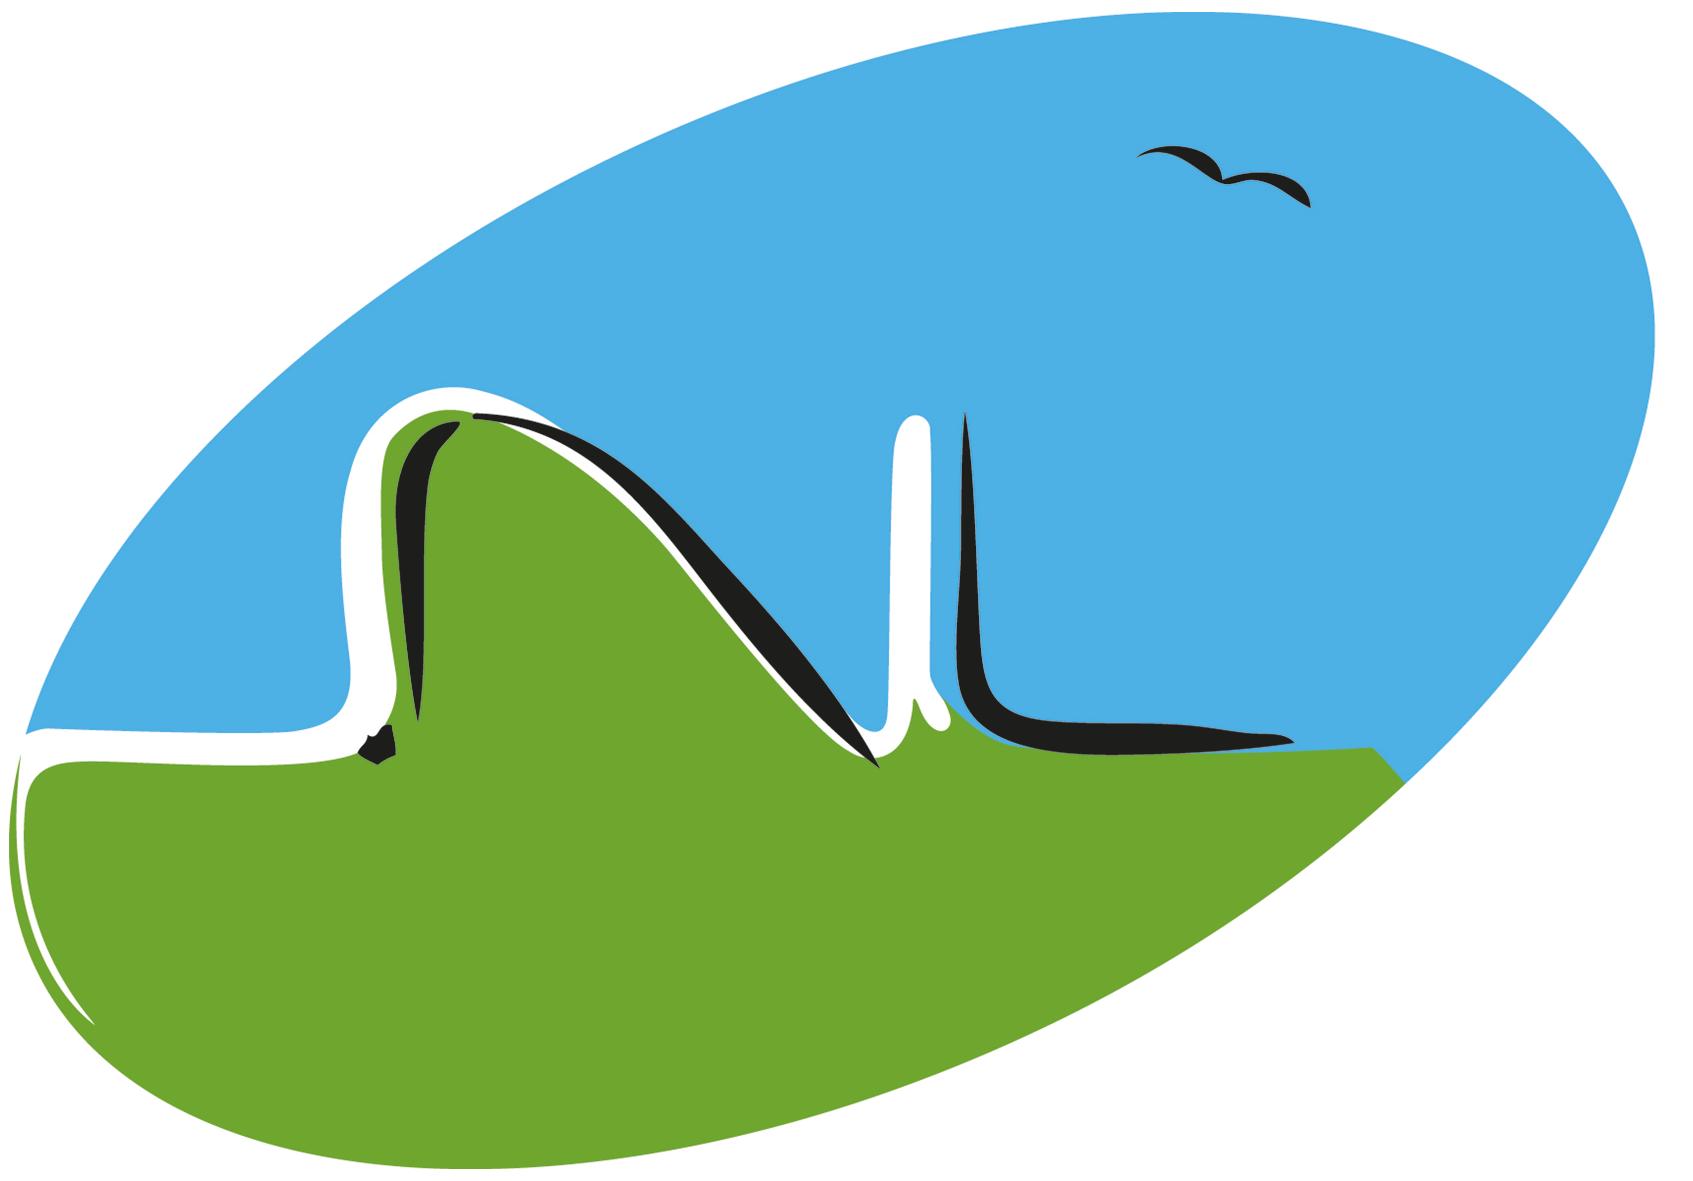 Logo-NL-Greenlabel-met-tekst